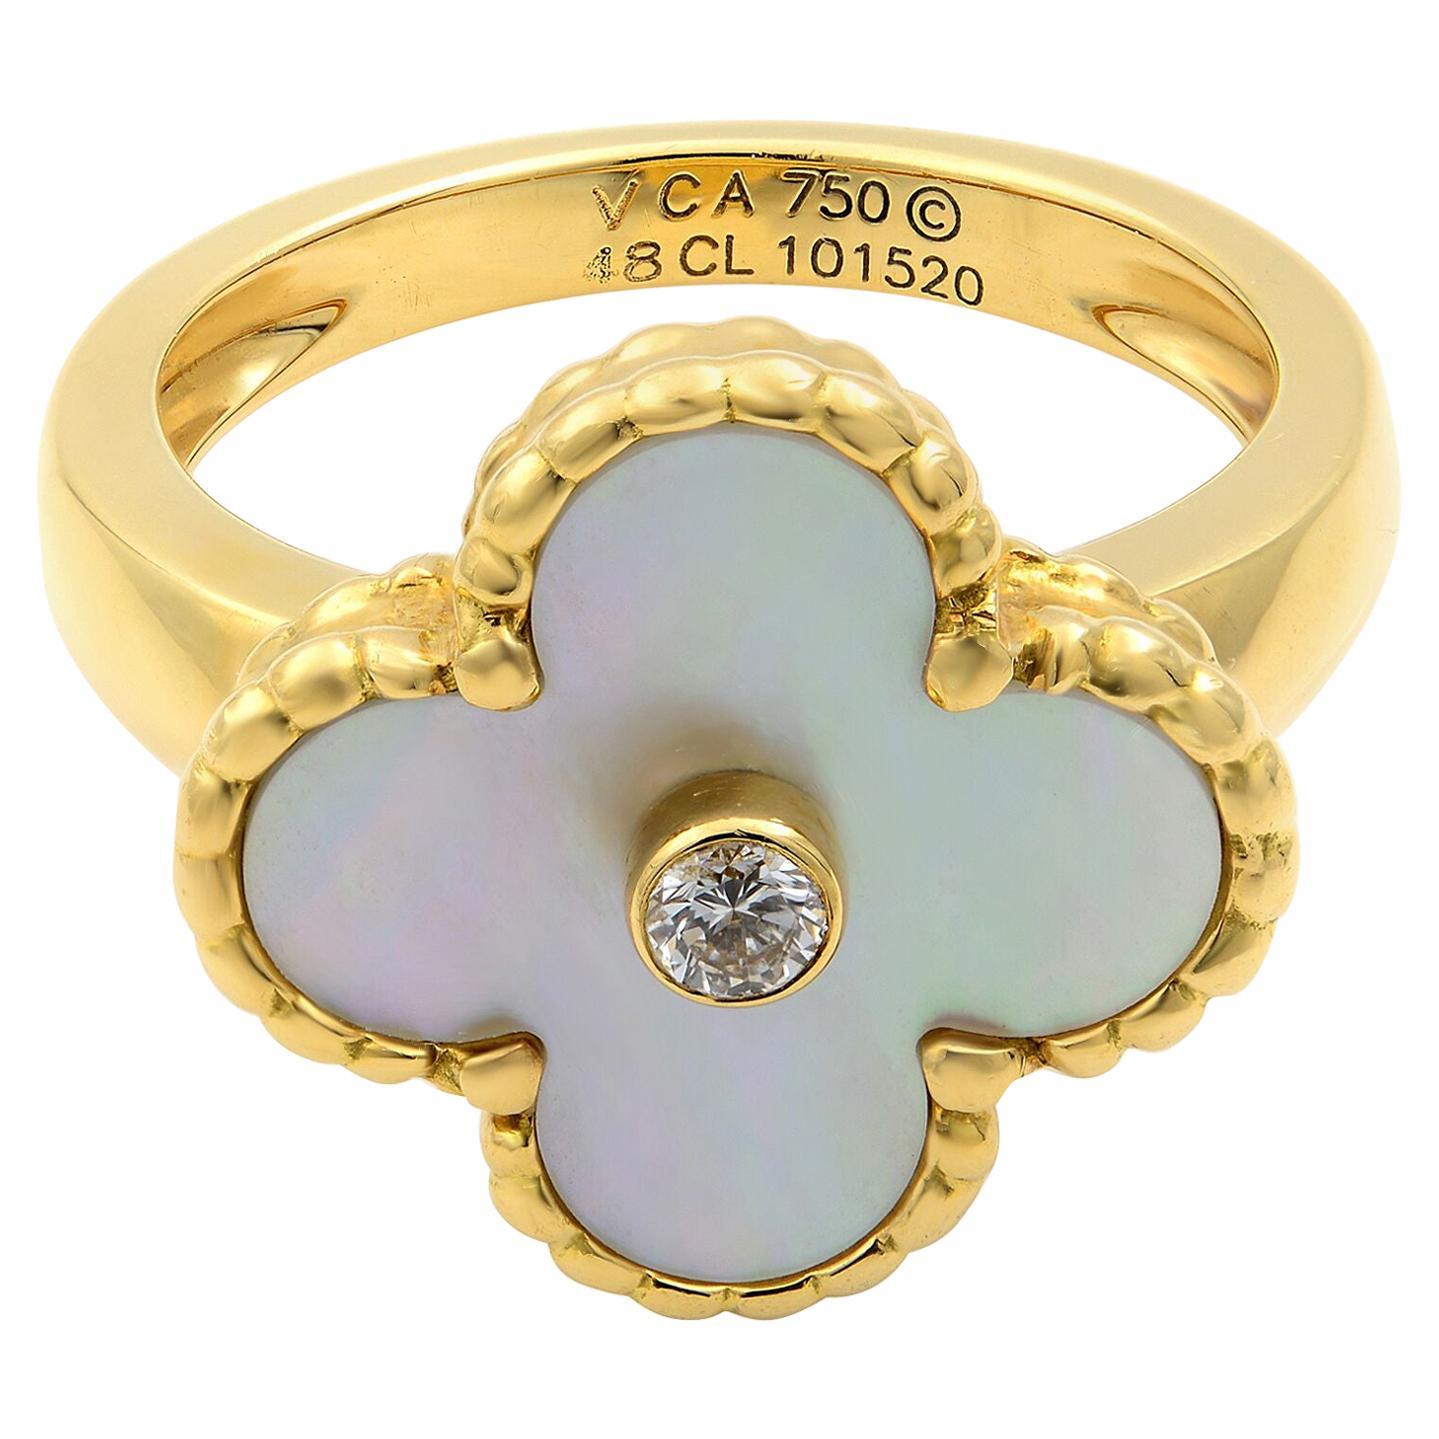 Van Cleef & Arpels Vintage Alhambra Mother of Pearl Diamond Gold Ring